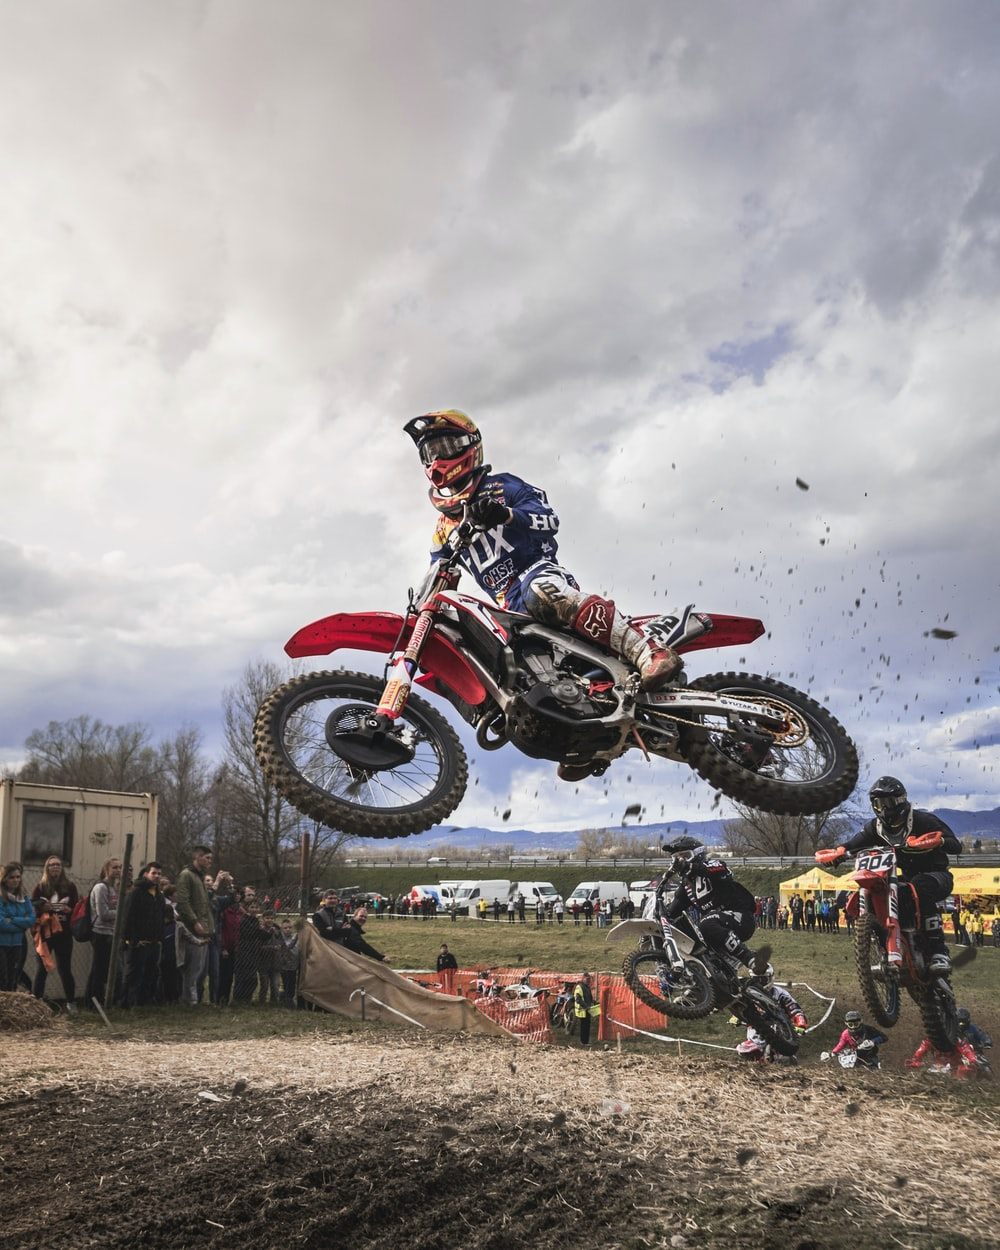 man riding red motocross dirt bike